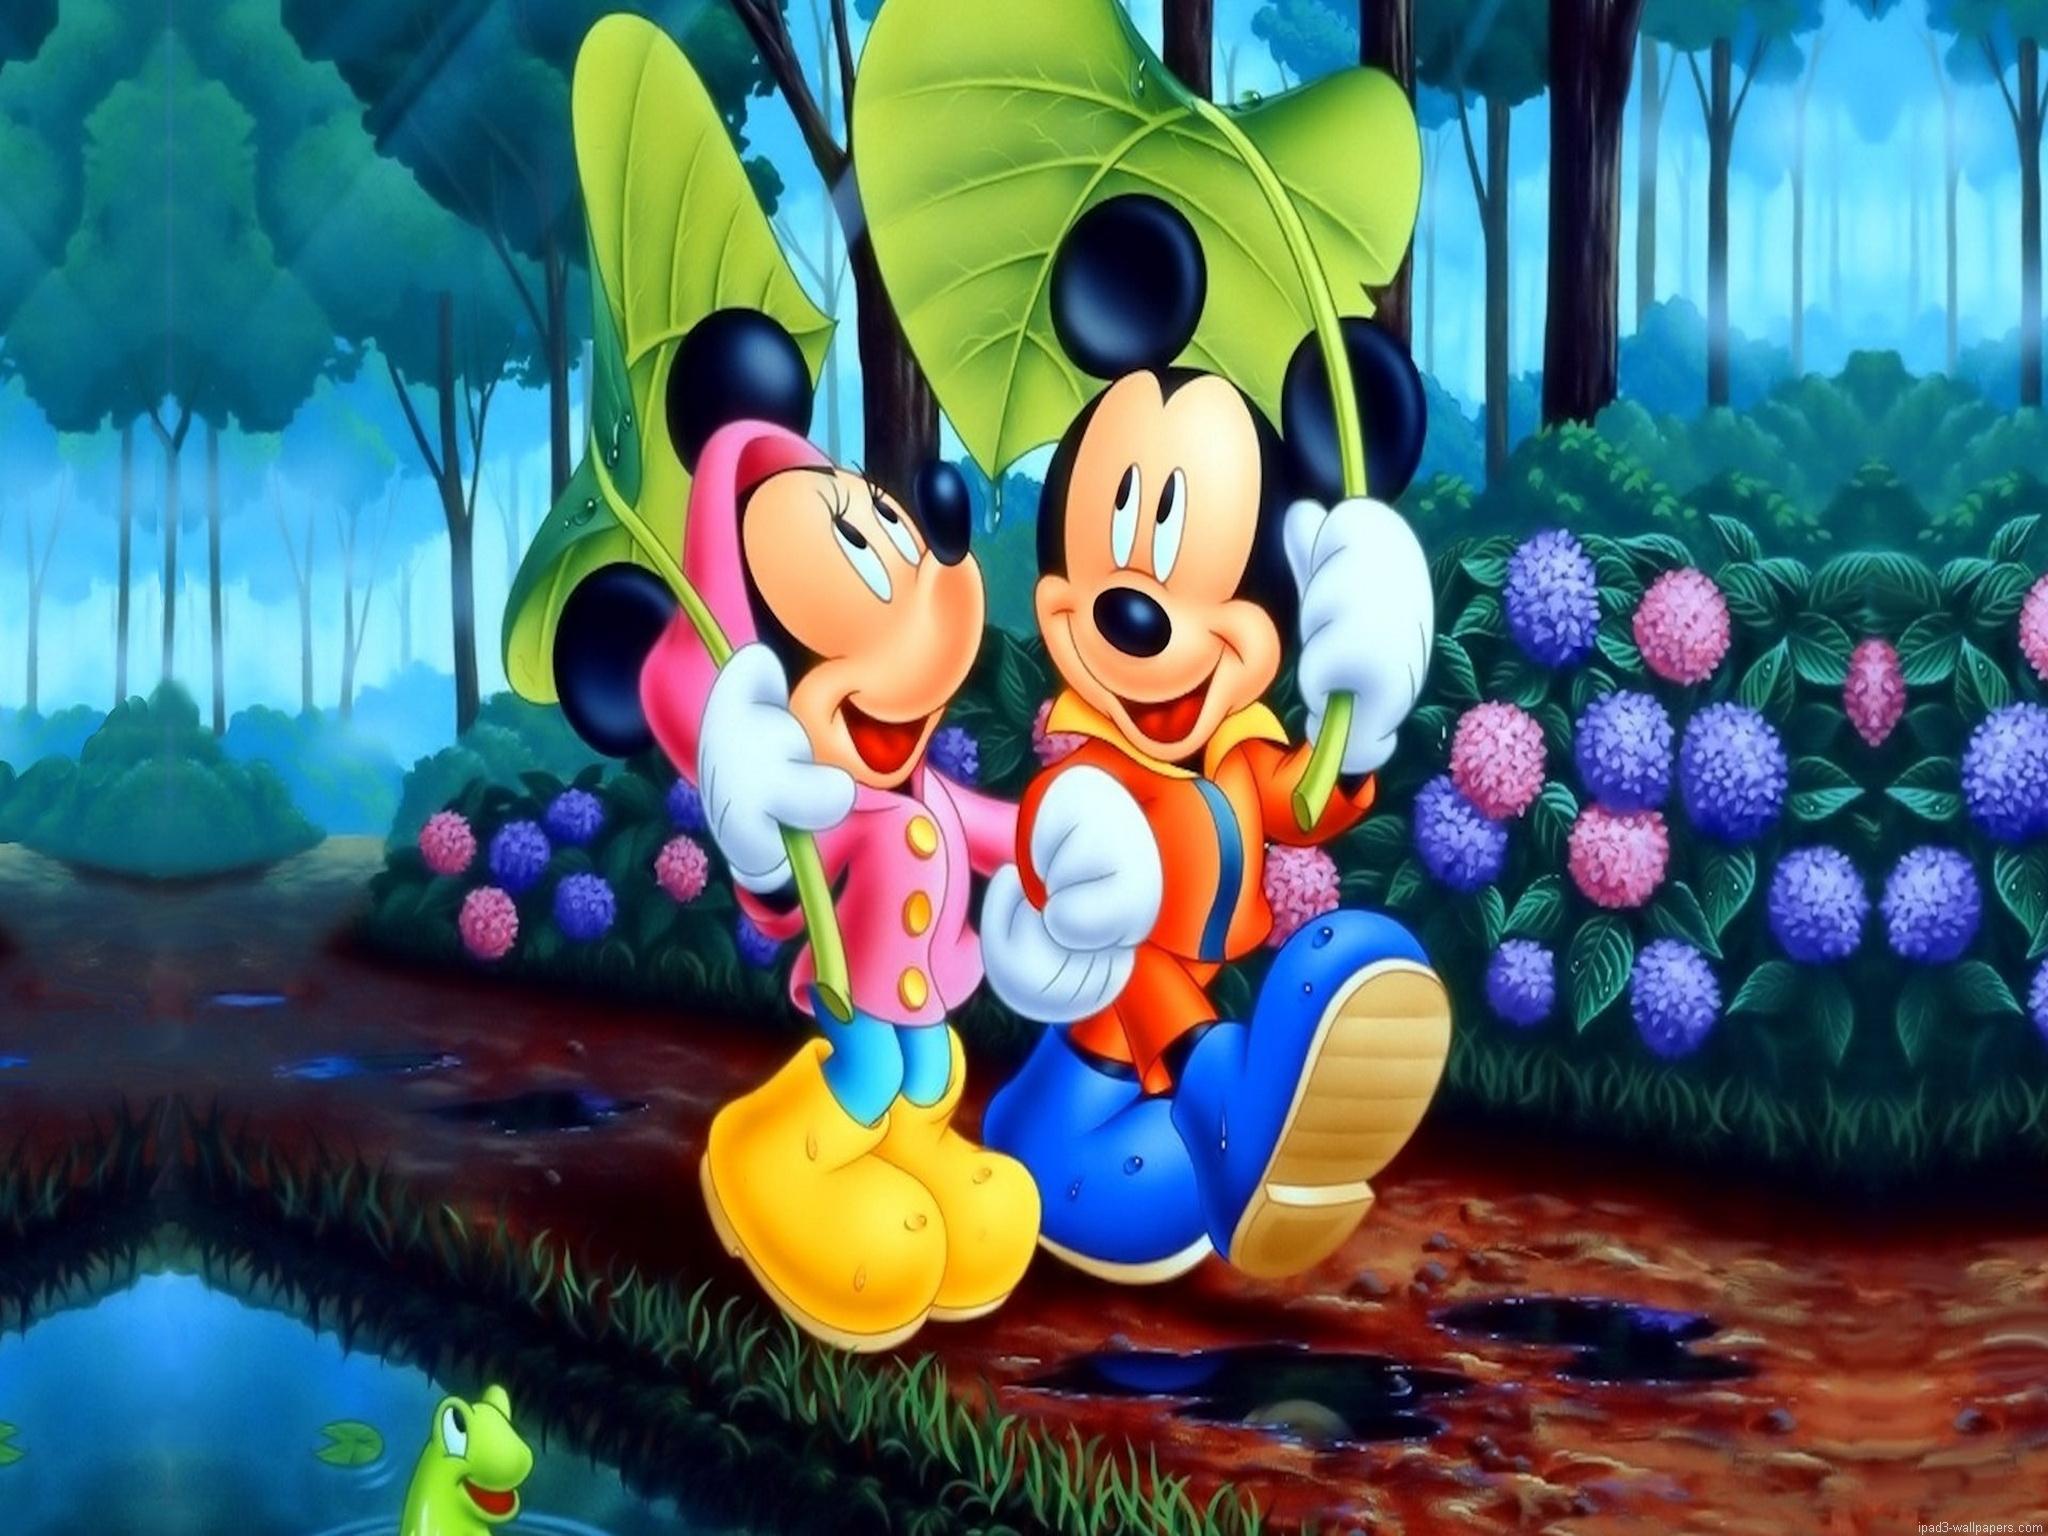 Romantic Ipad Wallpaper: Disney Wallpapers For IPad